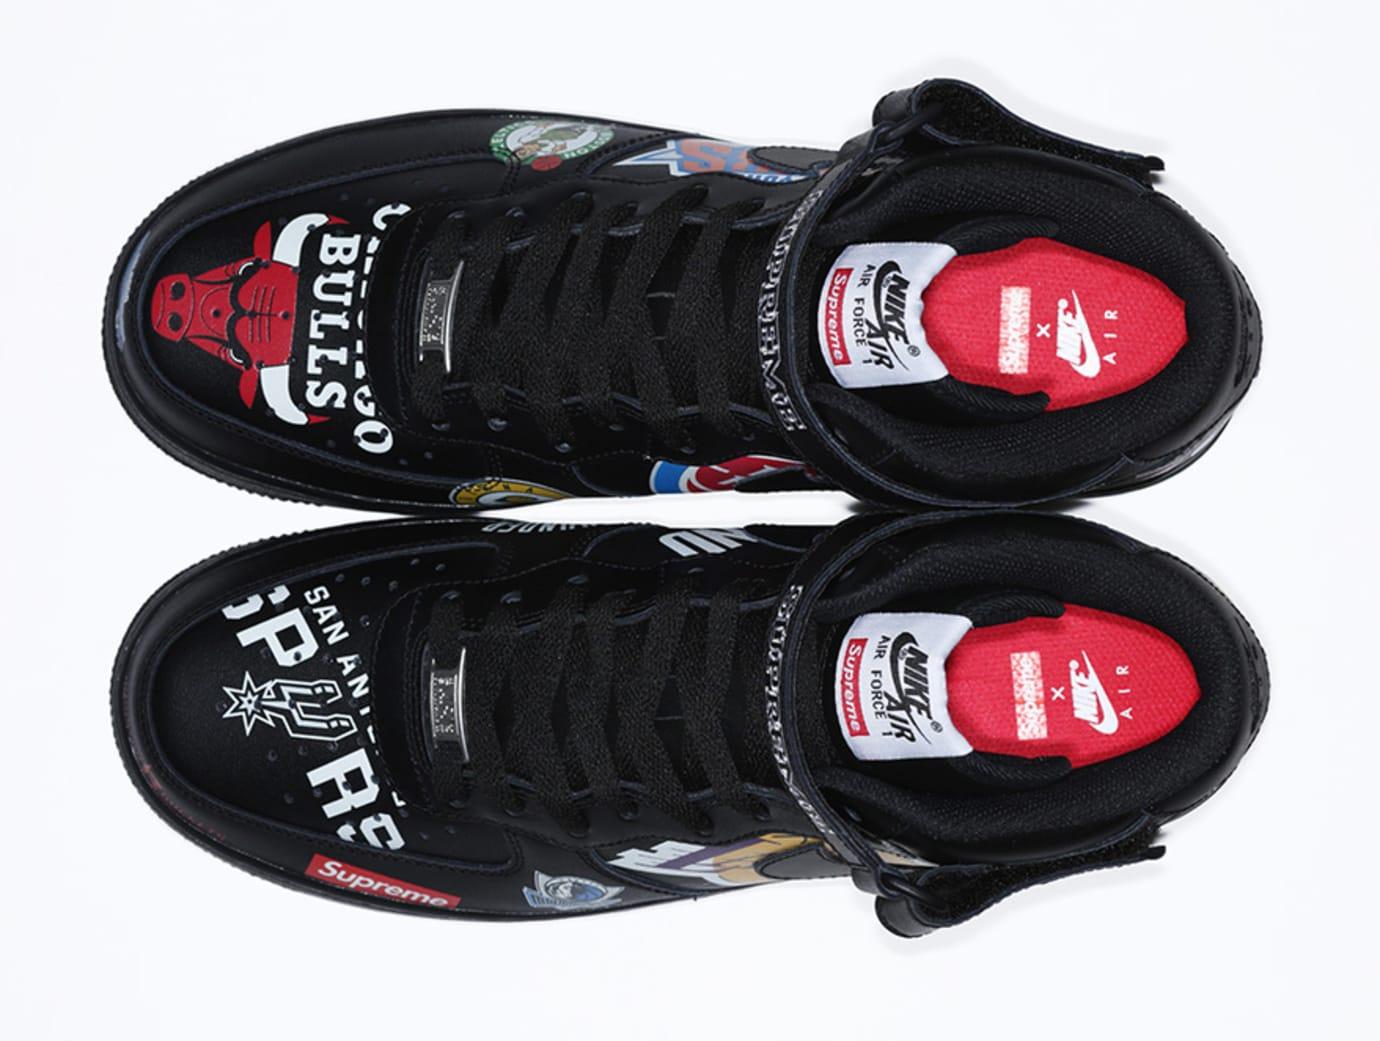 Supreme x Nike x NBA Air Force 1 Mid 'Black' AQ8017-001 (Top)